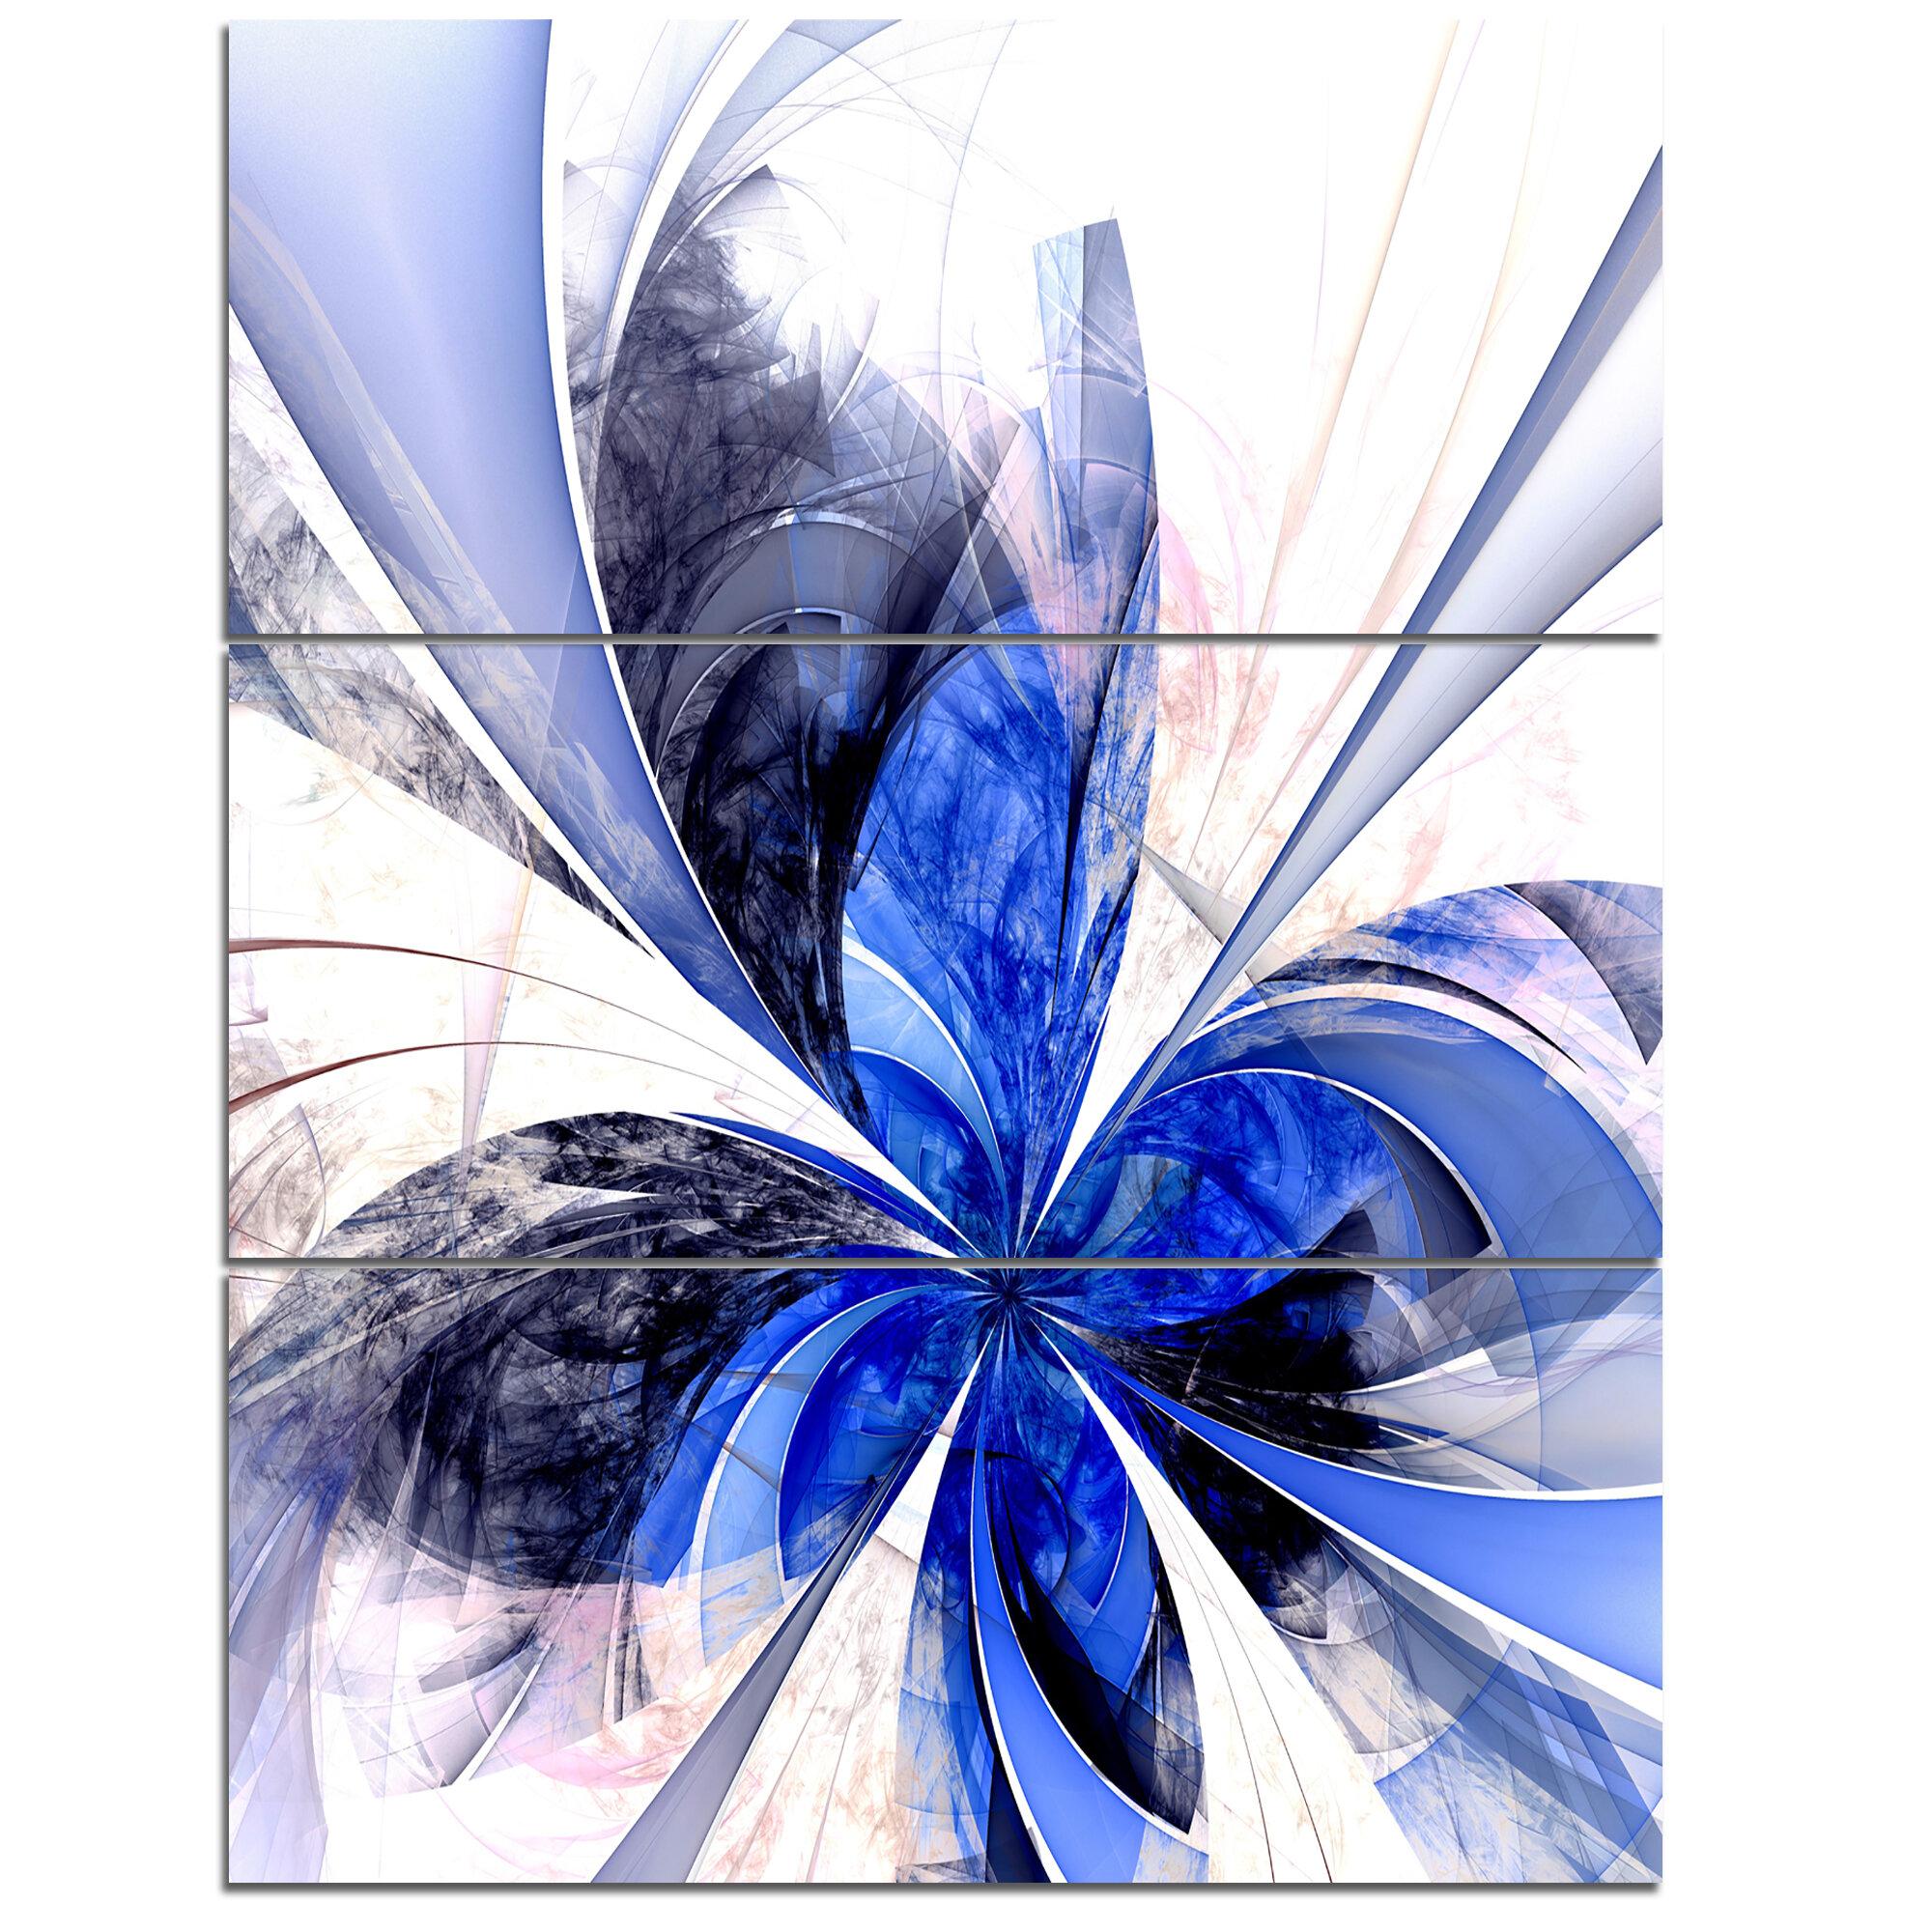 Designart Symmetrical Bright Blue Fractal Flower 3 Piece Graphic Art On Wrapped Canvas Set Wayfair